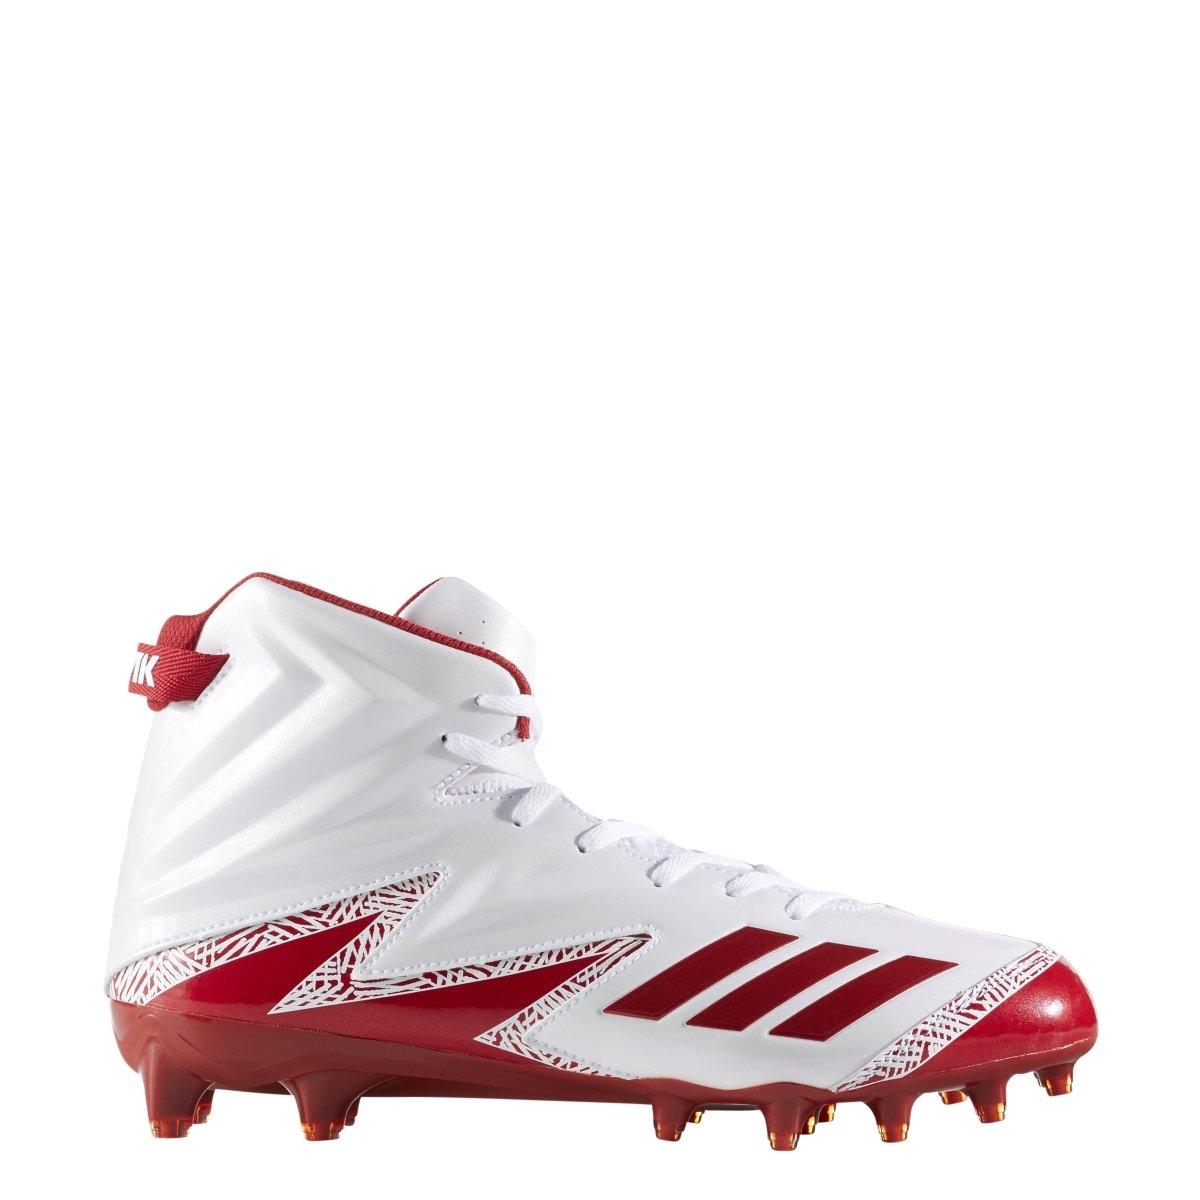 adidas Freak X Carbon High Cleat Men's Football